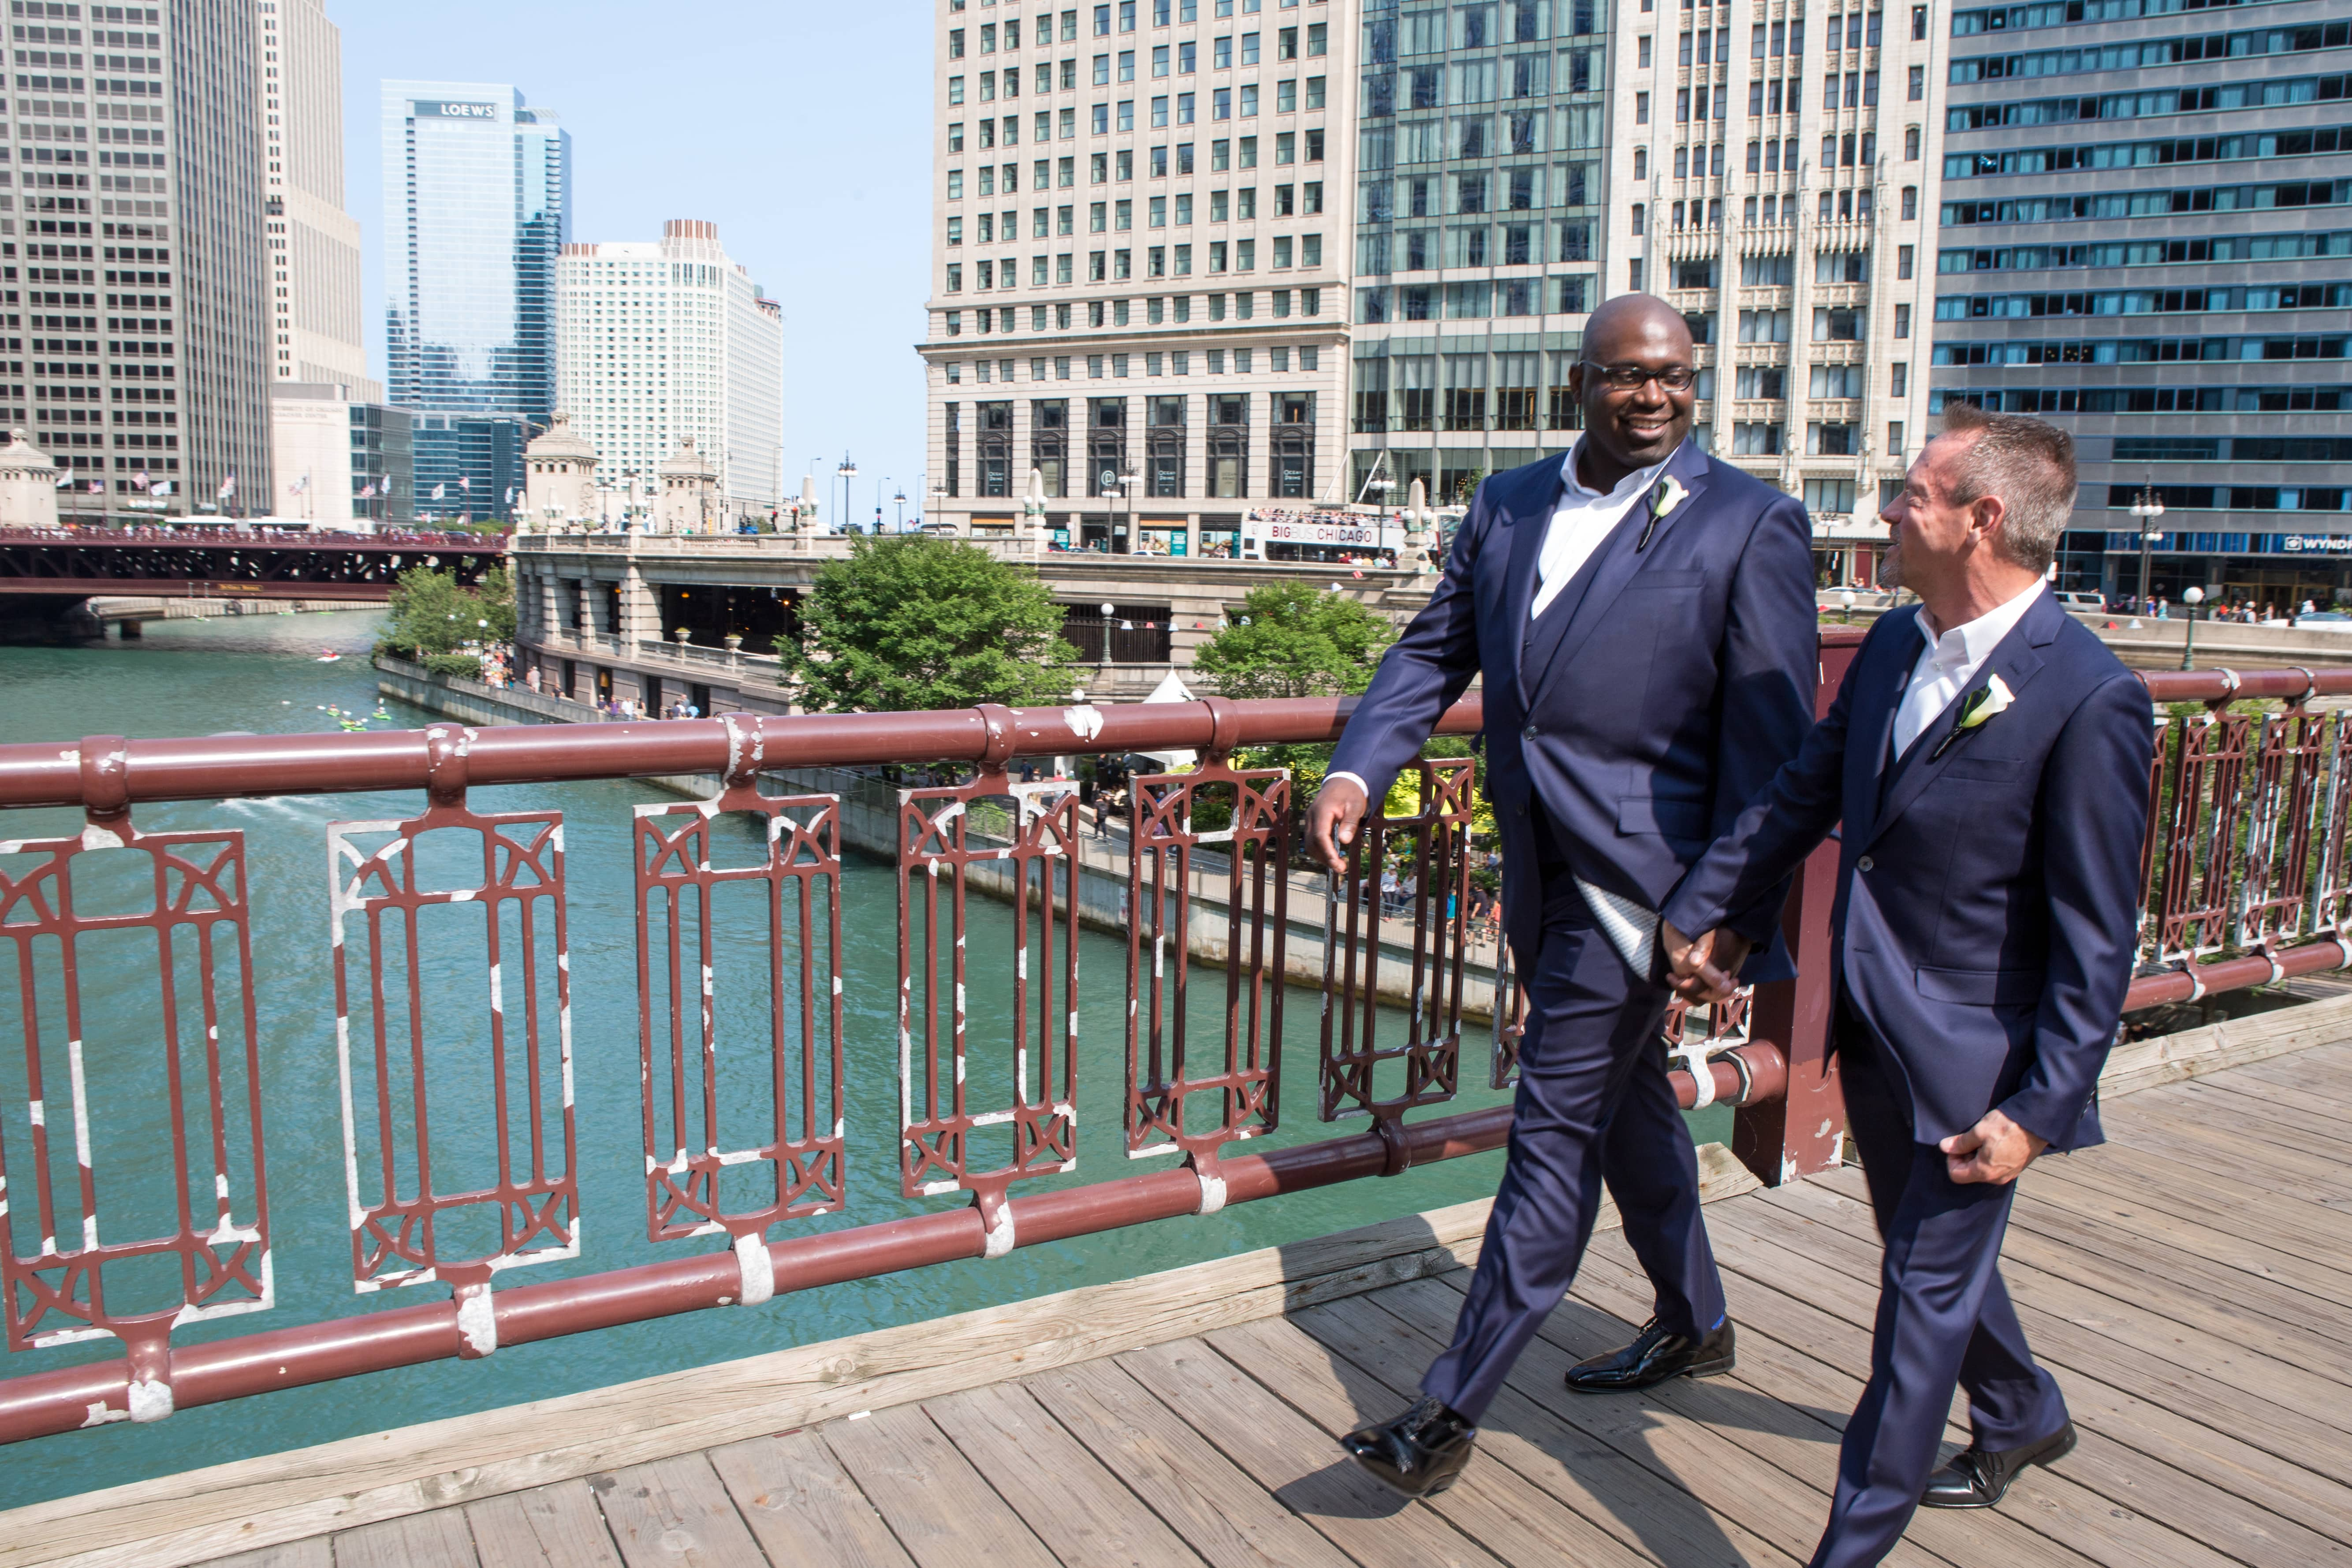 LGBT Wedding Couple crossing the Chicago River bridge